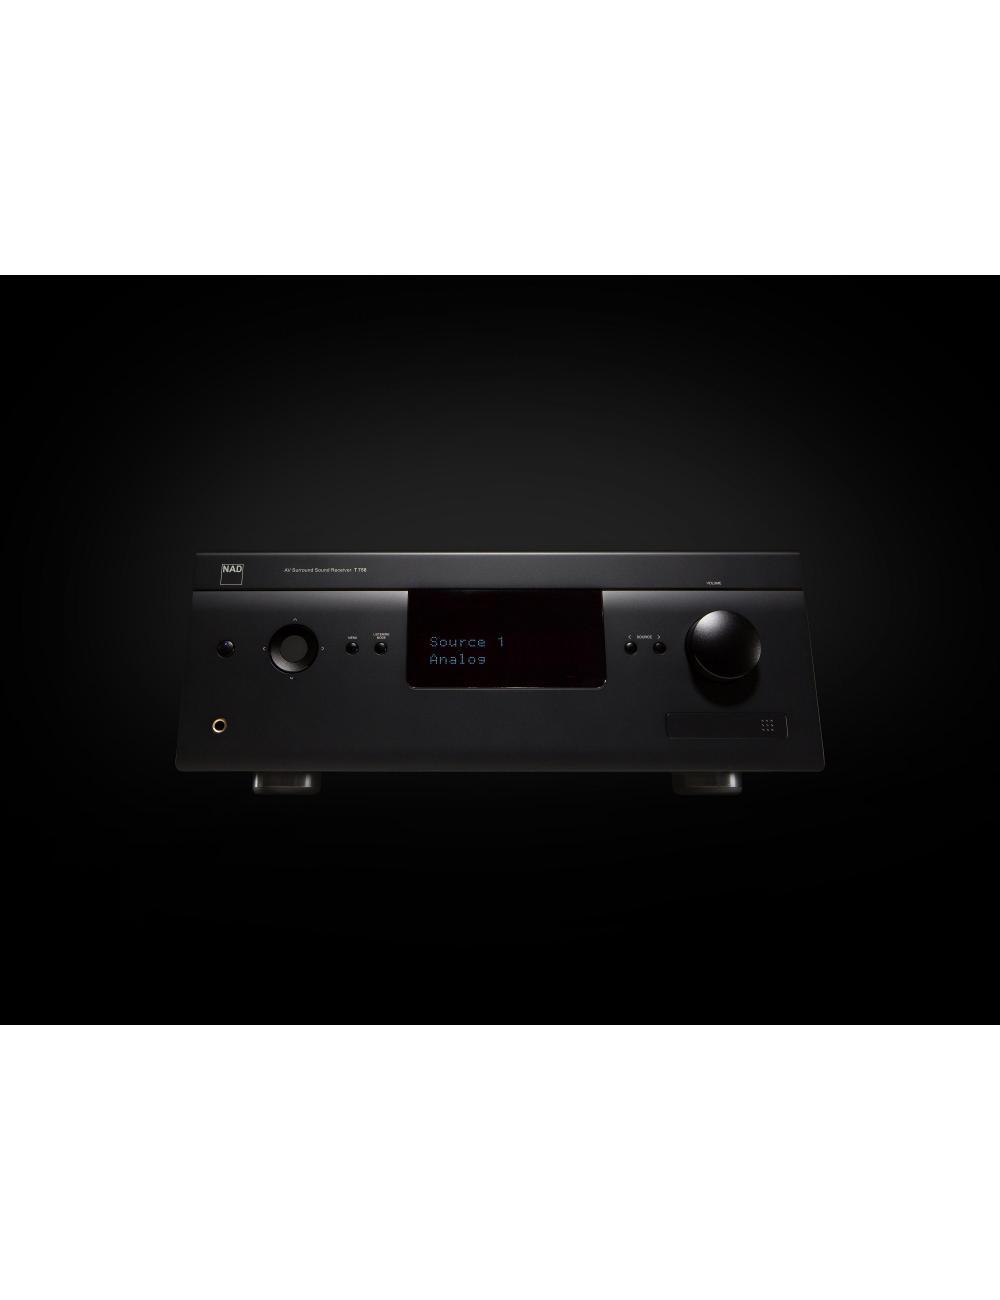 sintoamplificatore audio video multicanale, NAD T 758 v3, vista frontale